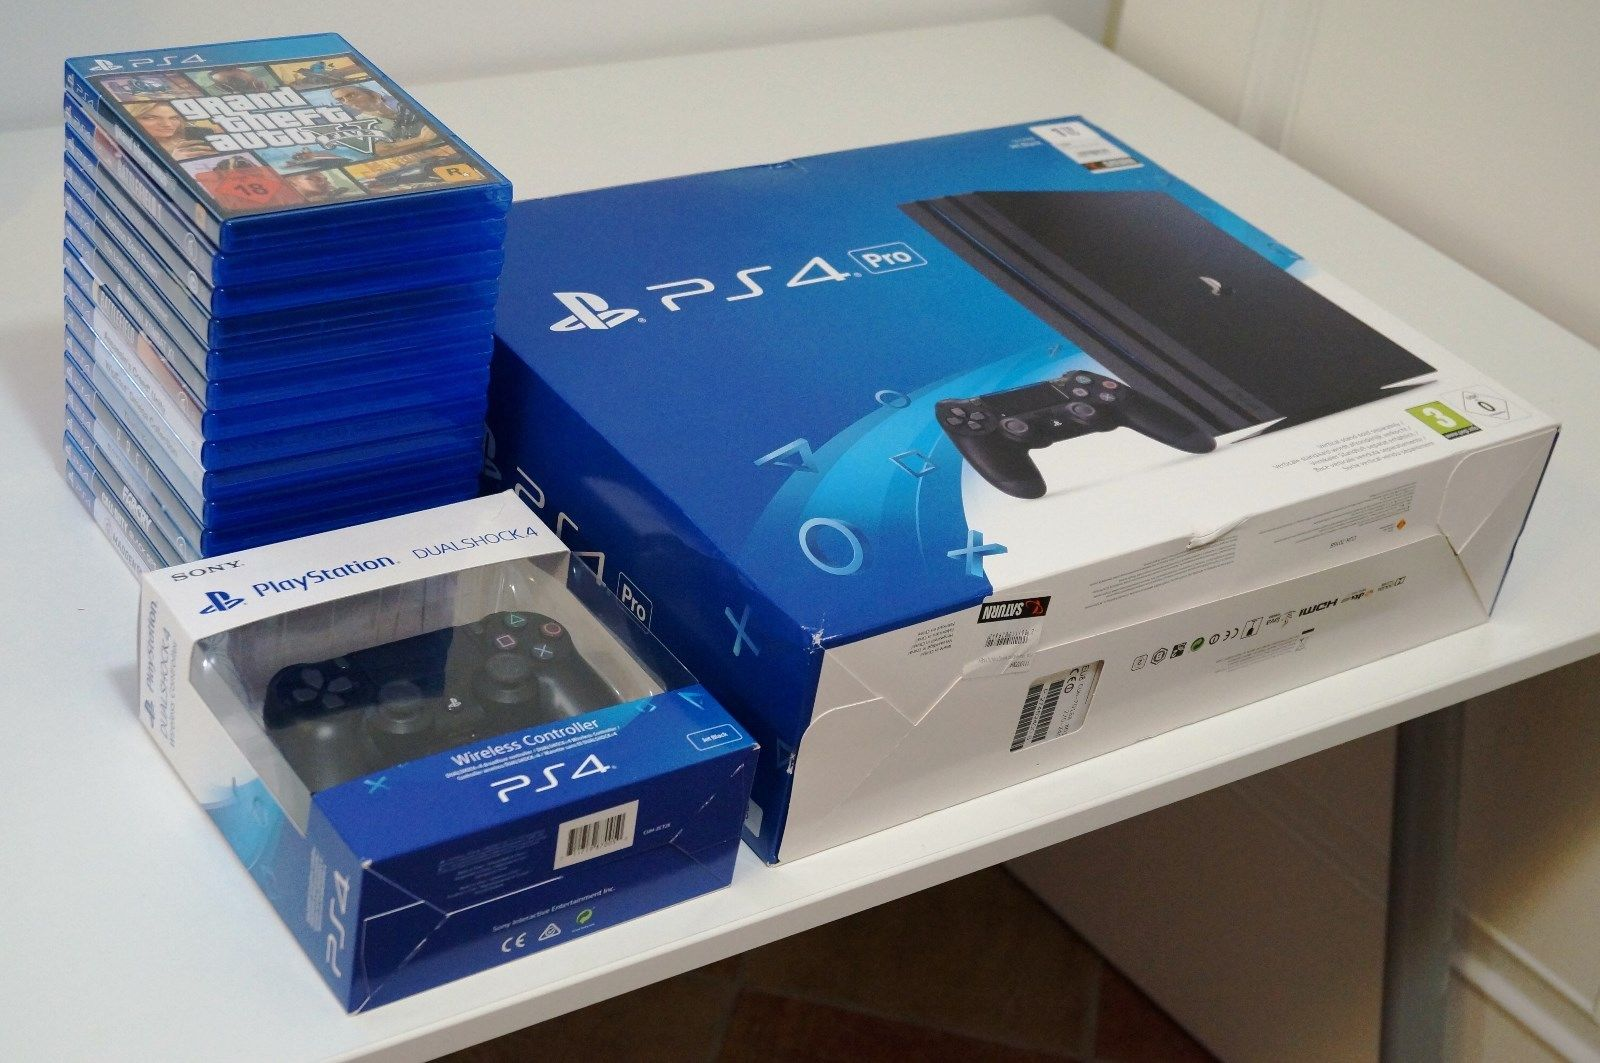 Order – New Sony PlayStation 4 Slim & Microsoft Xbox One X Full Bundle